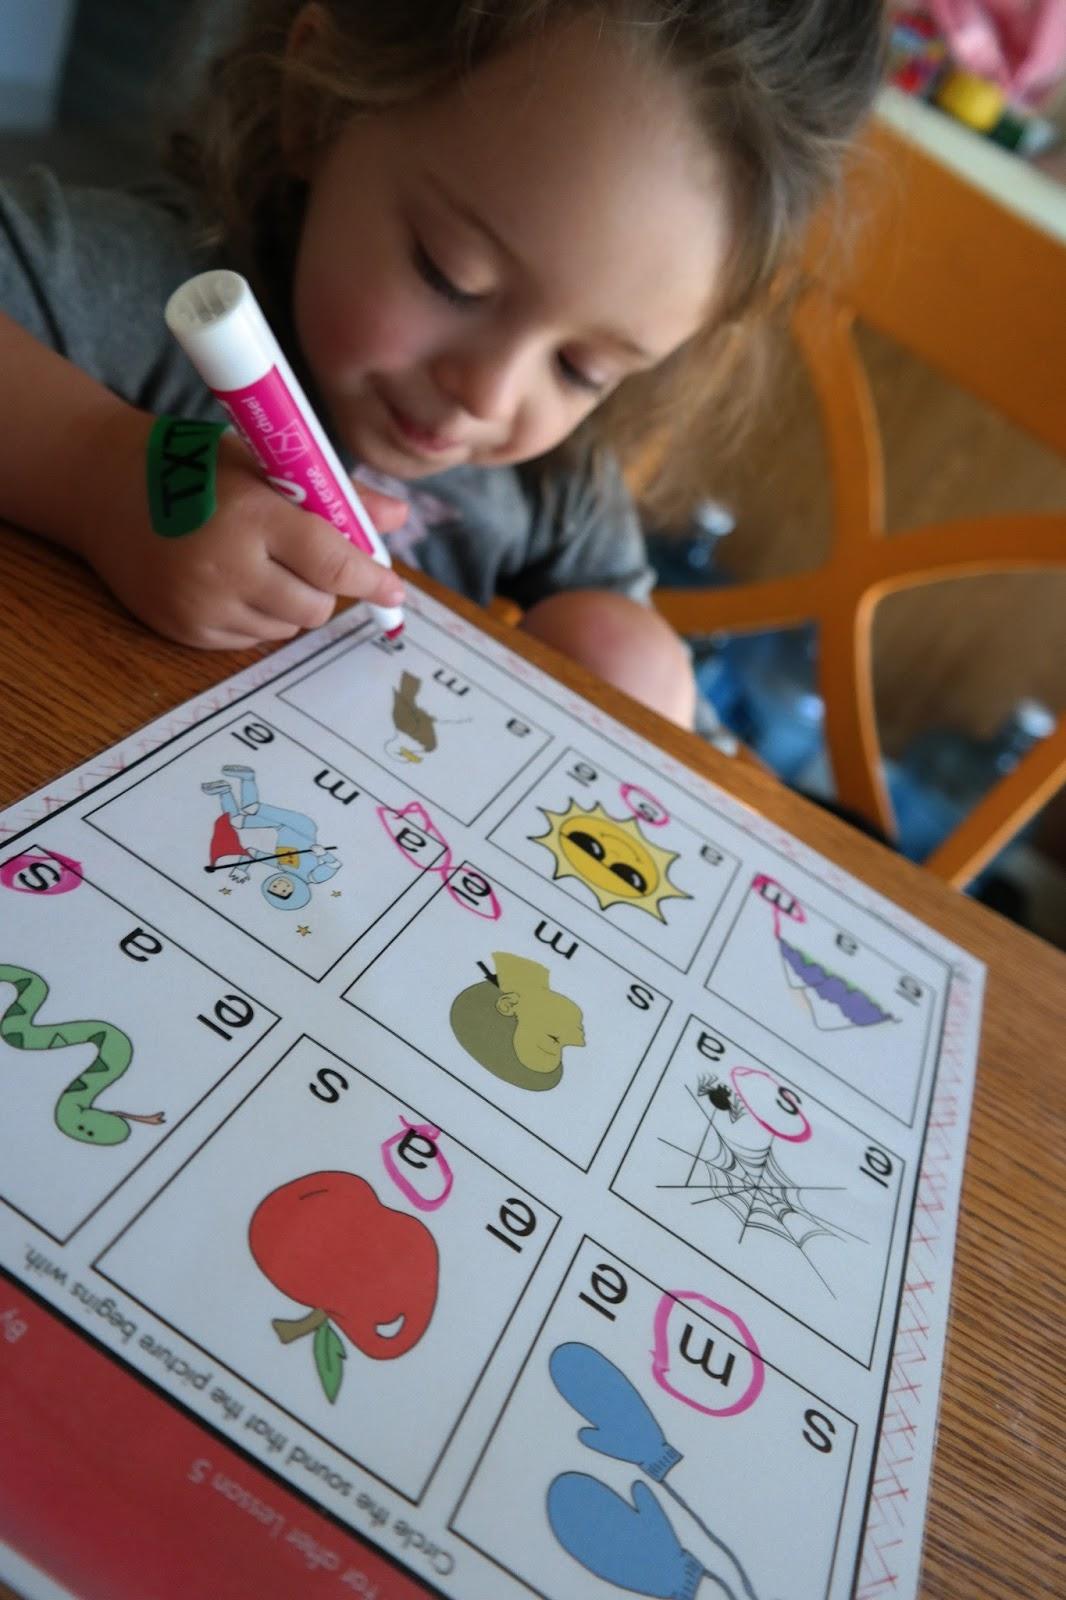 Glimmercat Preparing To Teach My Child To Read Via 100